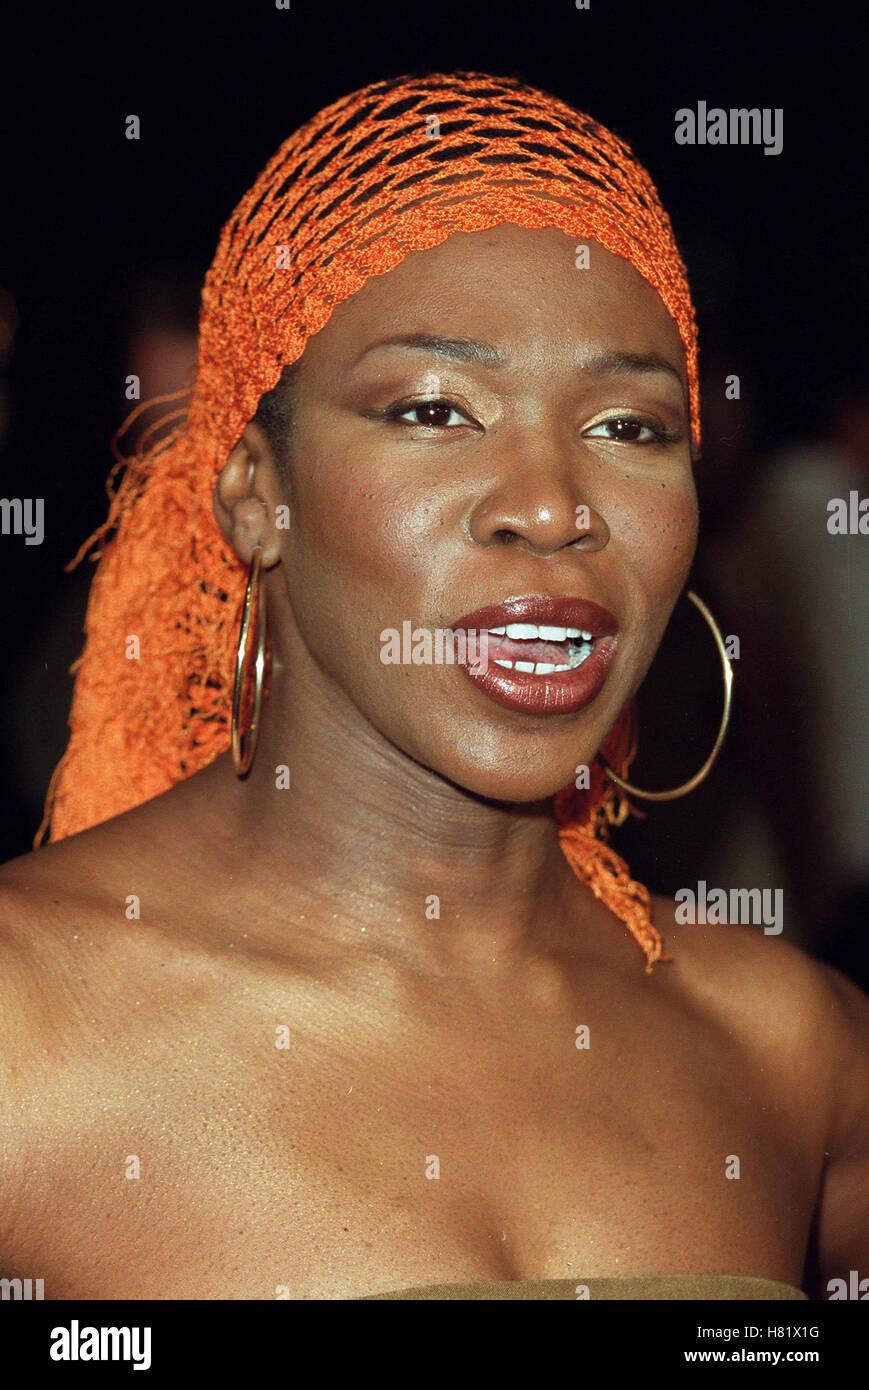 INDIAARIE MUHAMMAD ALI'S 60TH BIRTHDAY KODAK THEATRE LA USA 12 January 2002 - Stock Image